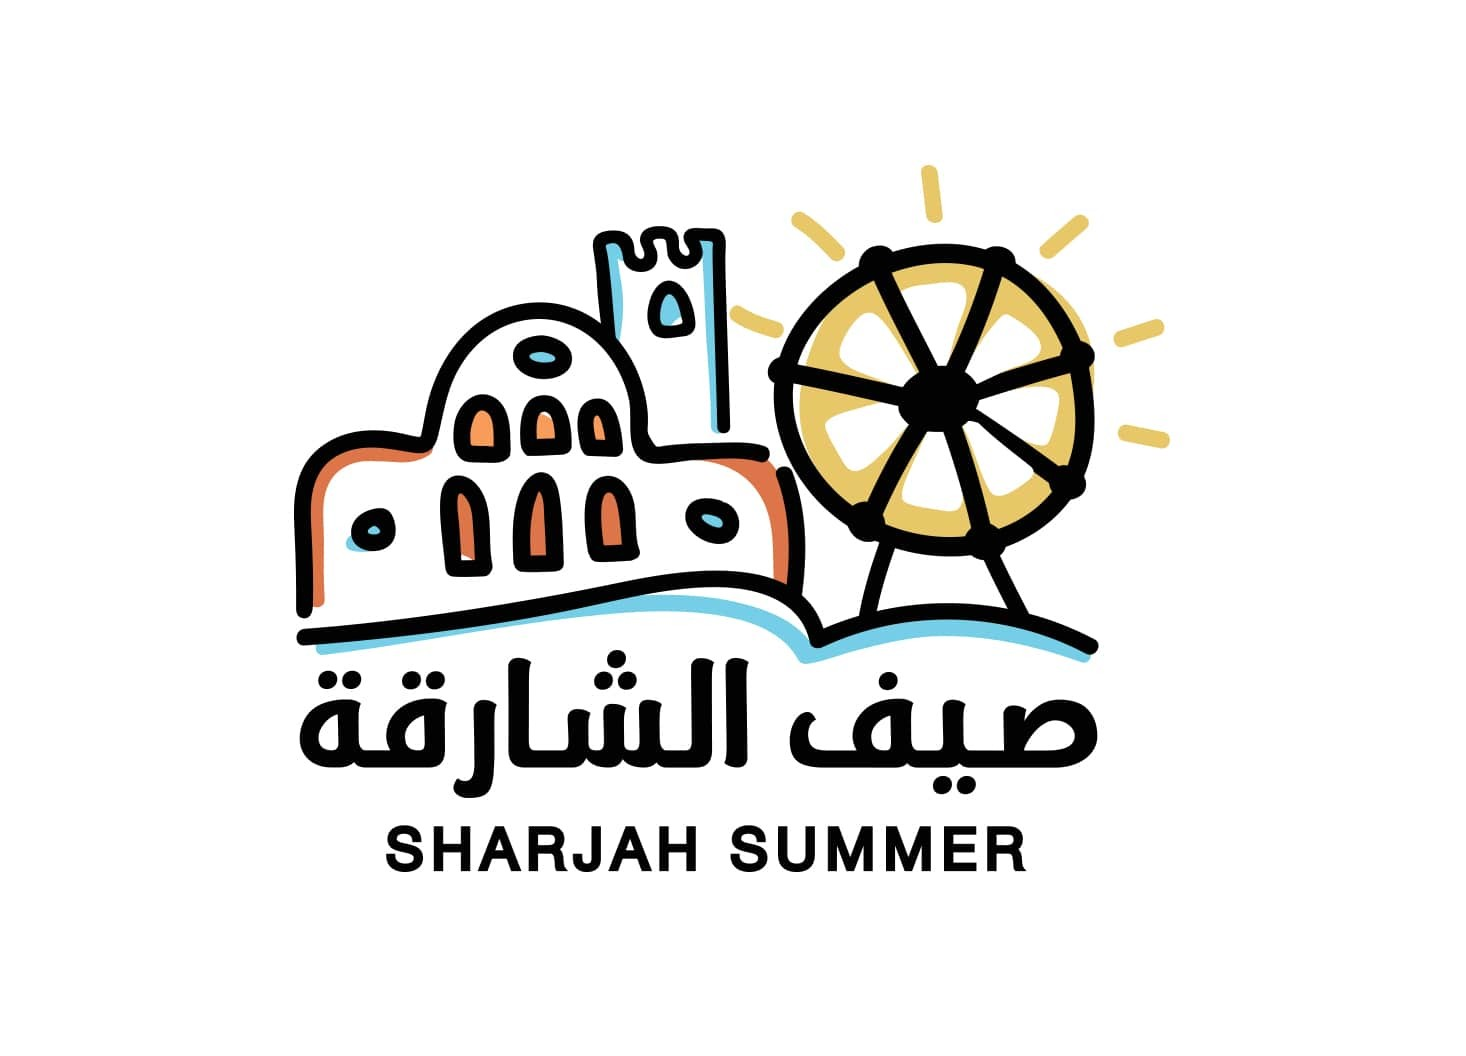 Sharjah Summer - Hatch Design - Digital Creative Agency